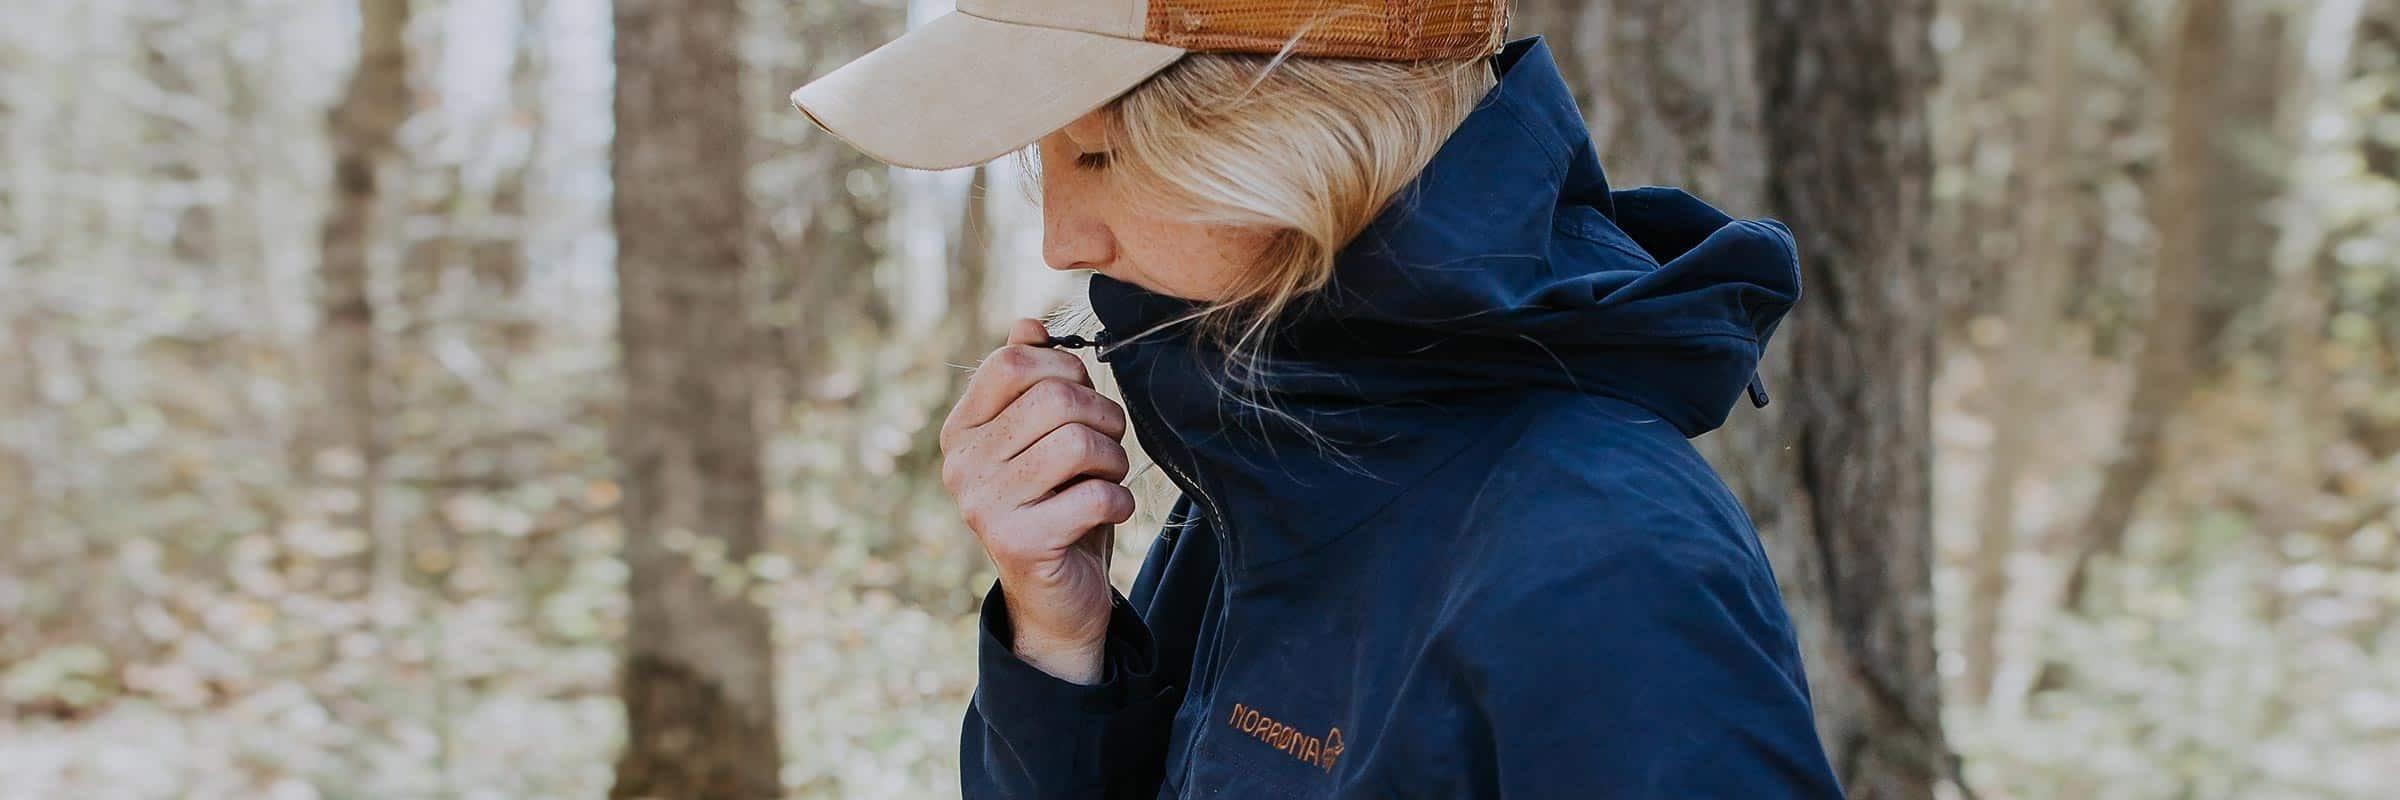 Norrøna Svalbard Cotton Jacket Reviewed